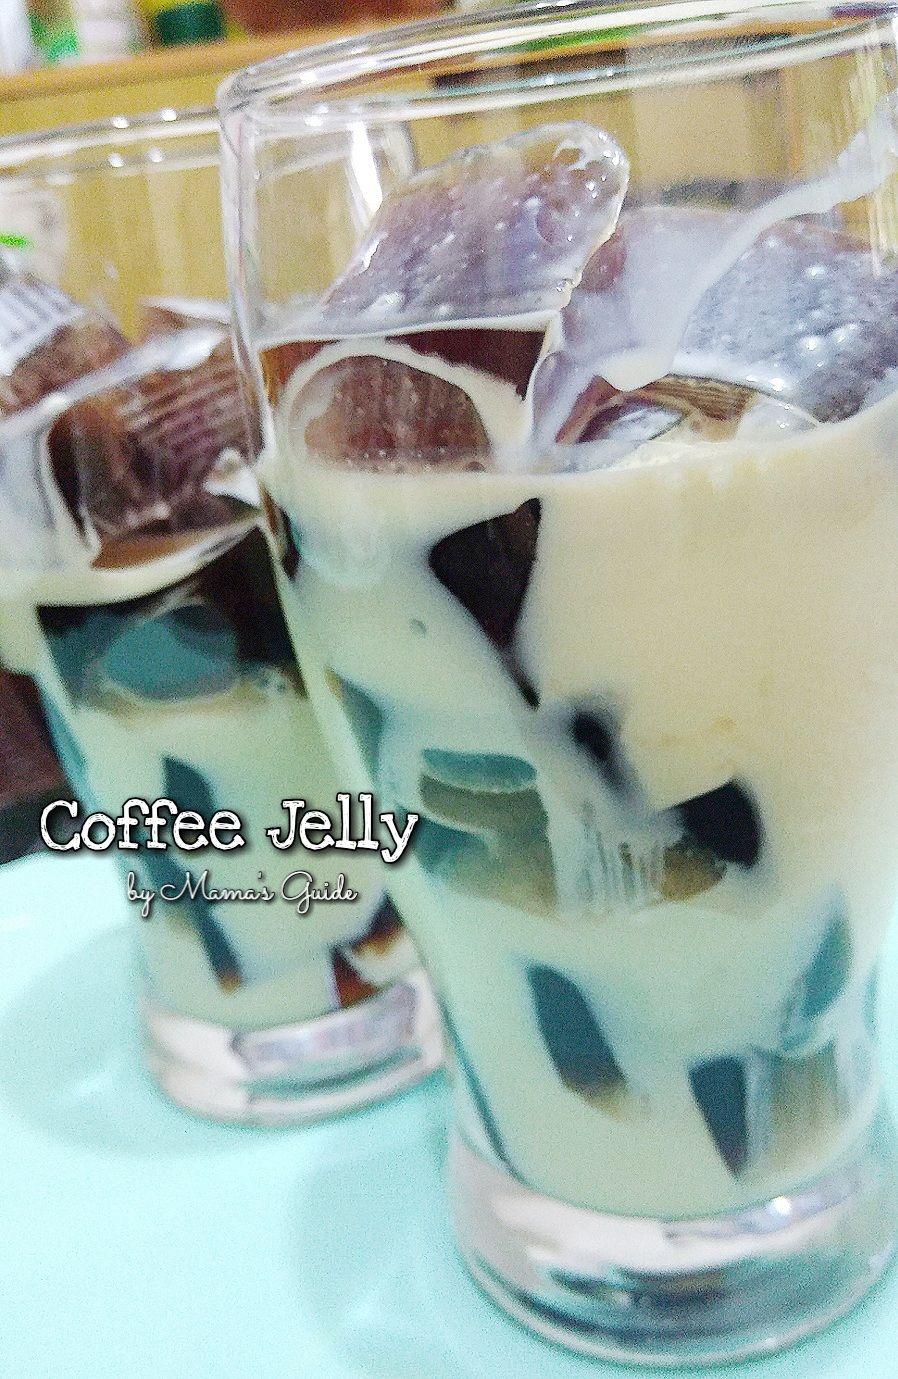 Coffee Jelly Coffee jelly, Jelly recipes, Fun desserts